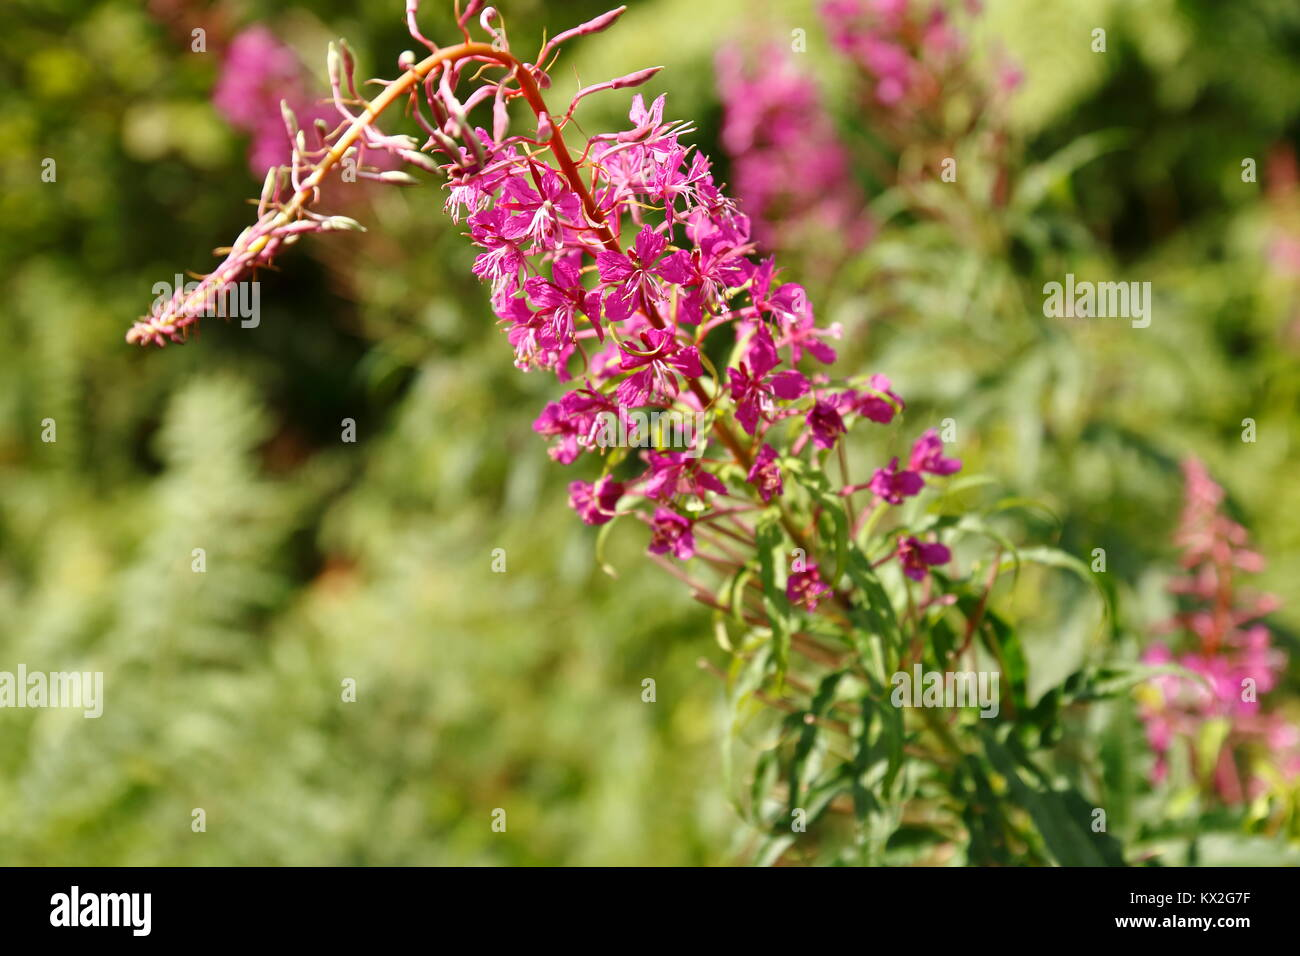 Heideröschen, Nachtkerze mit lila pink Blüte - Stock Image